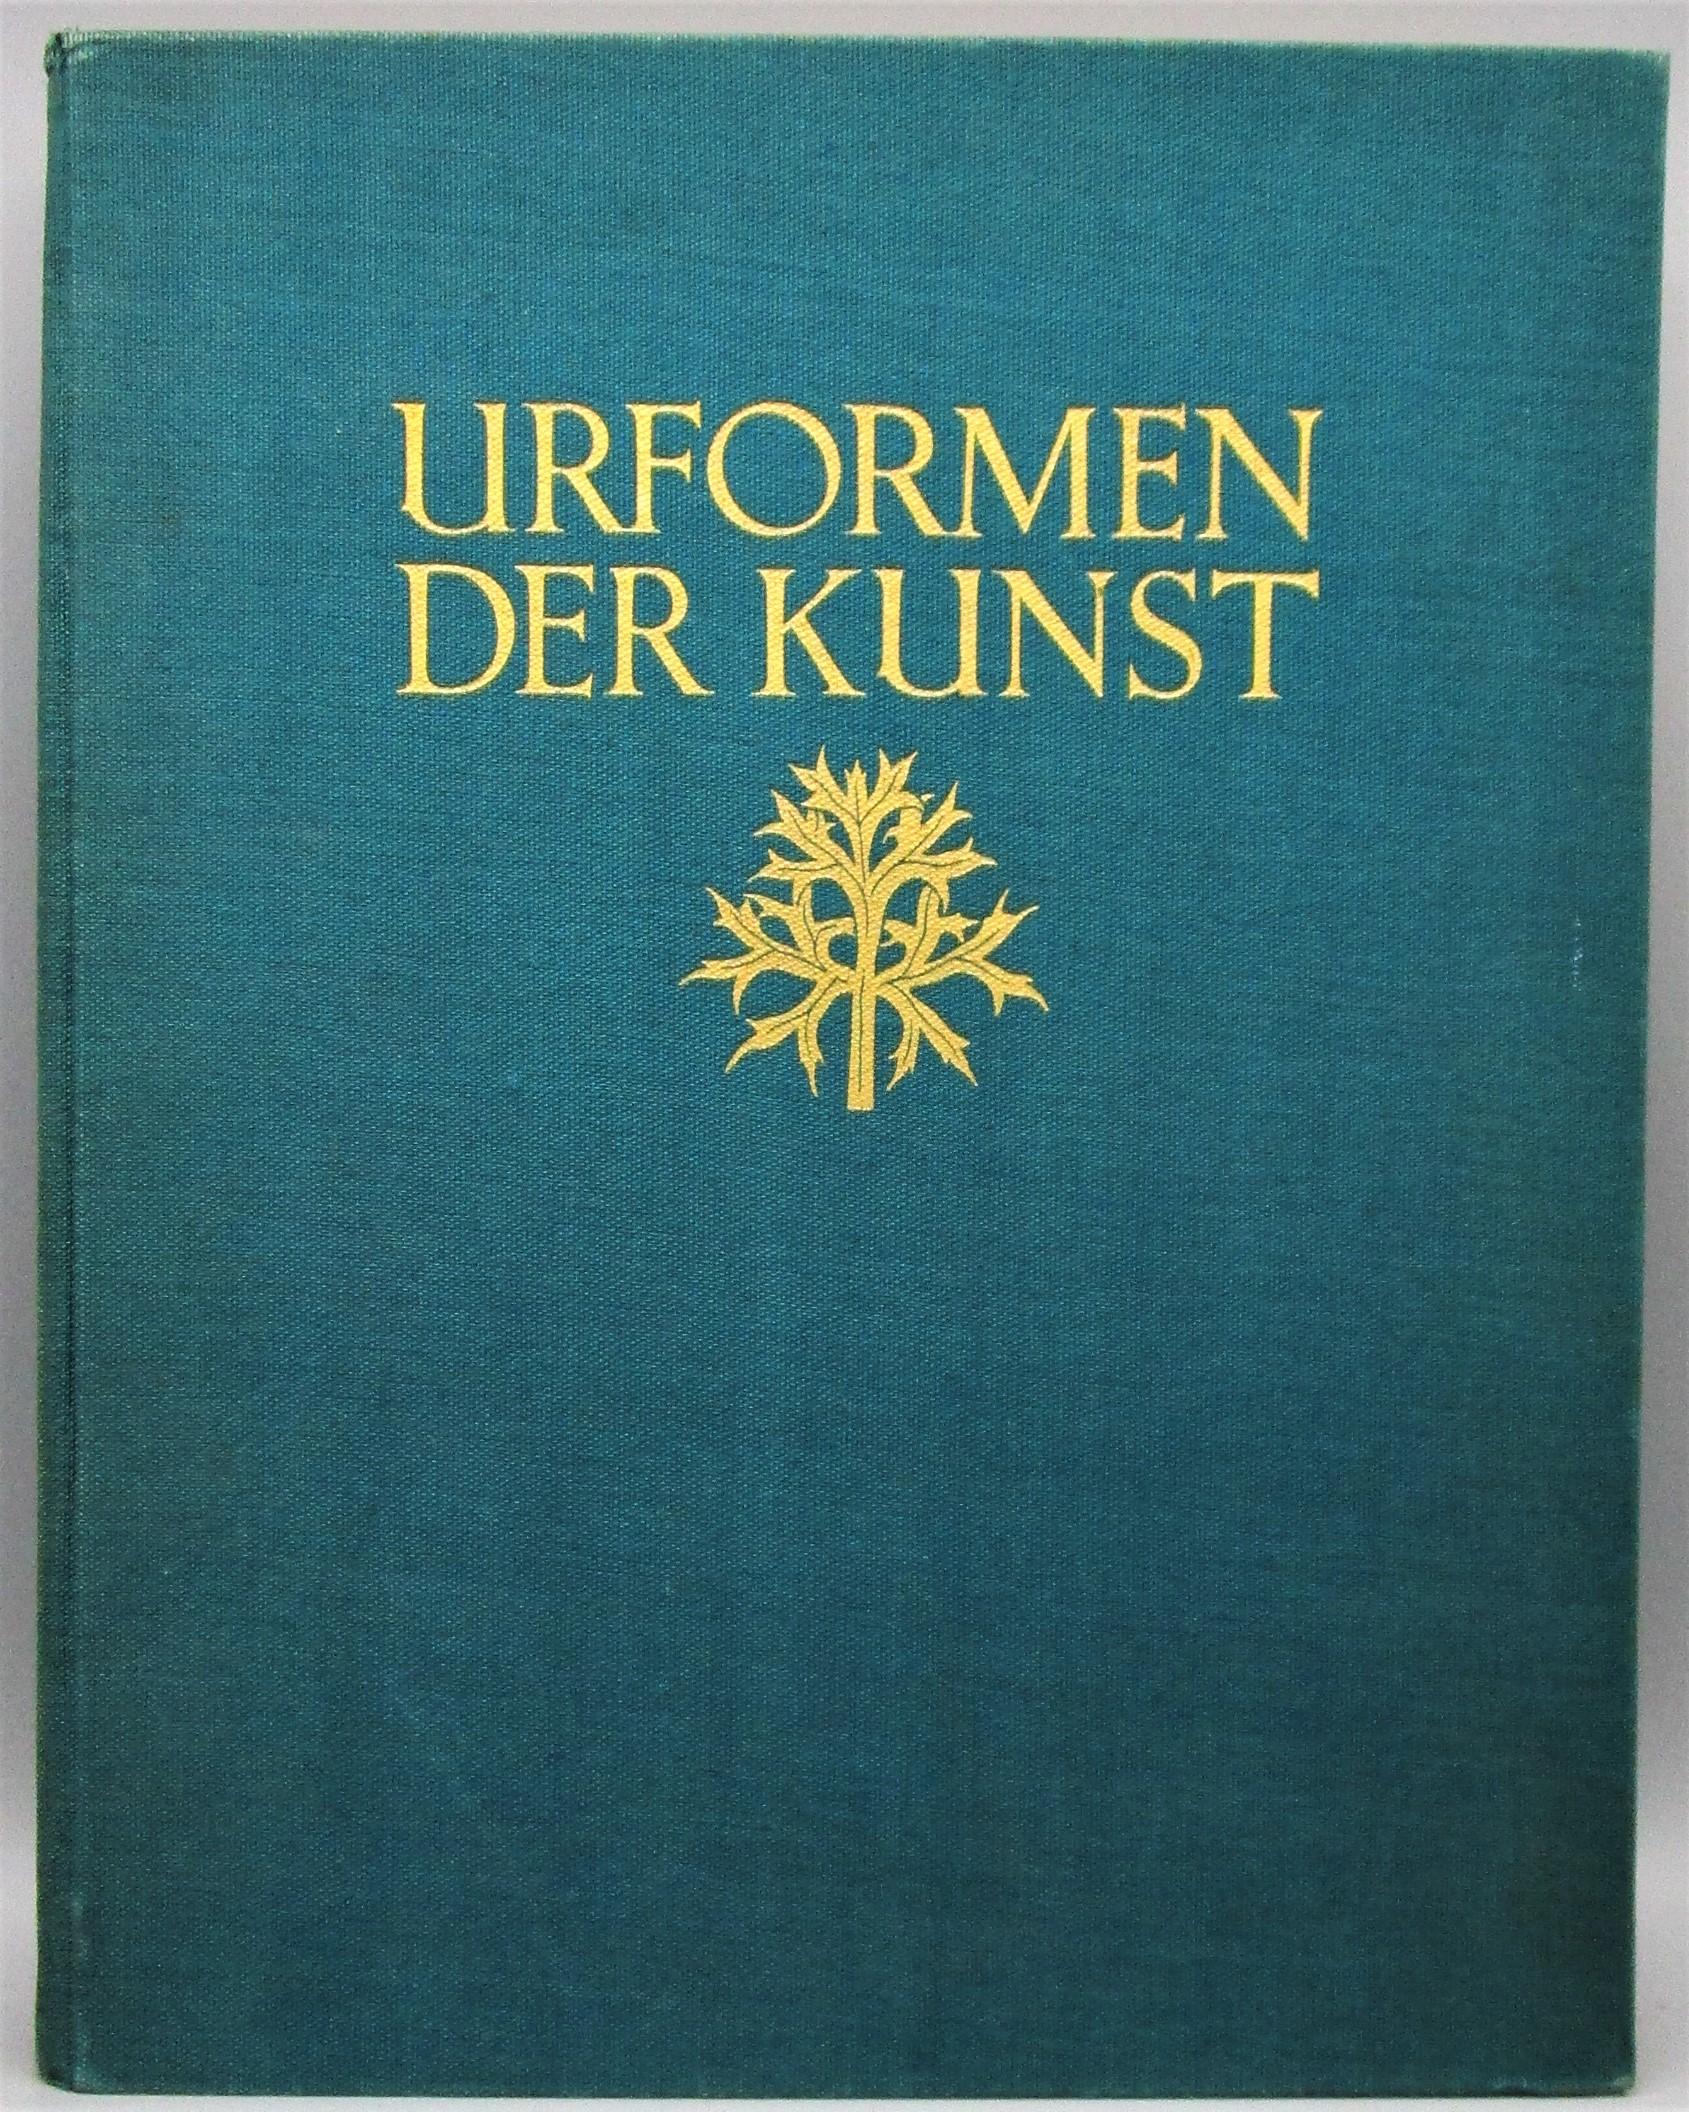 URFORMEN DER KUNST, by Karl Blossfeldt - 1928 [1st Ed]